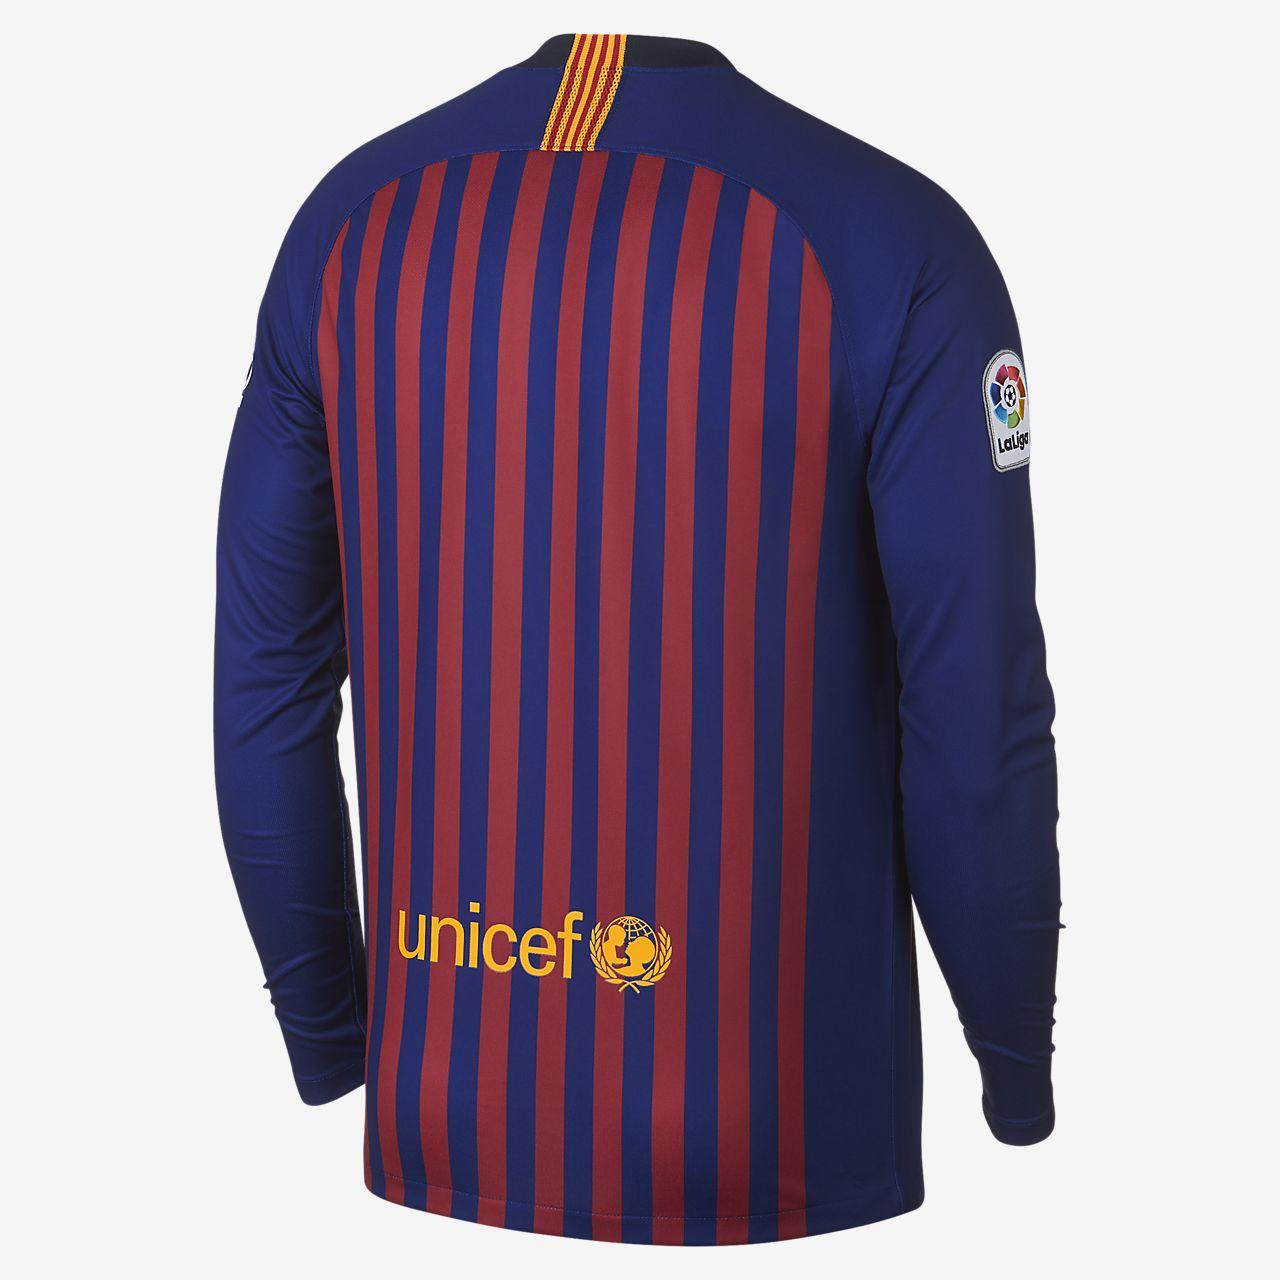 65425200ca3 ... 2018/19 FC Barcelona Stadium Home Men's Long-Sleeve Football Shirt